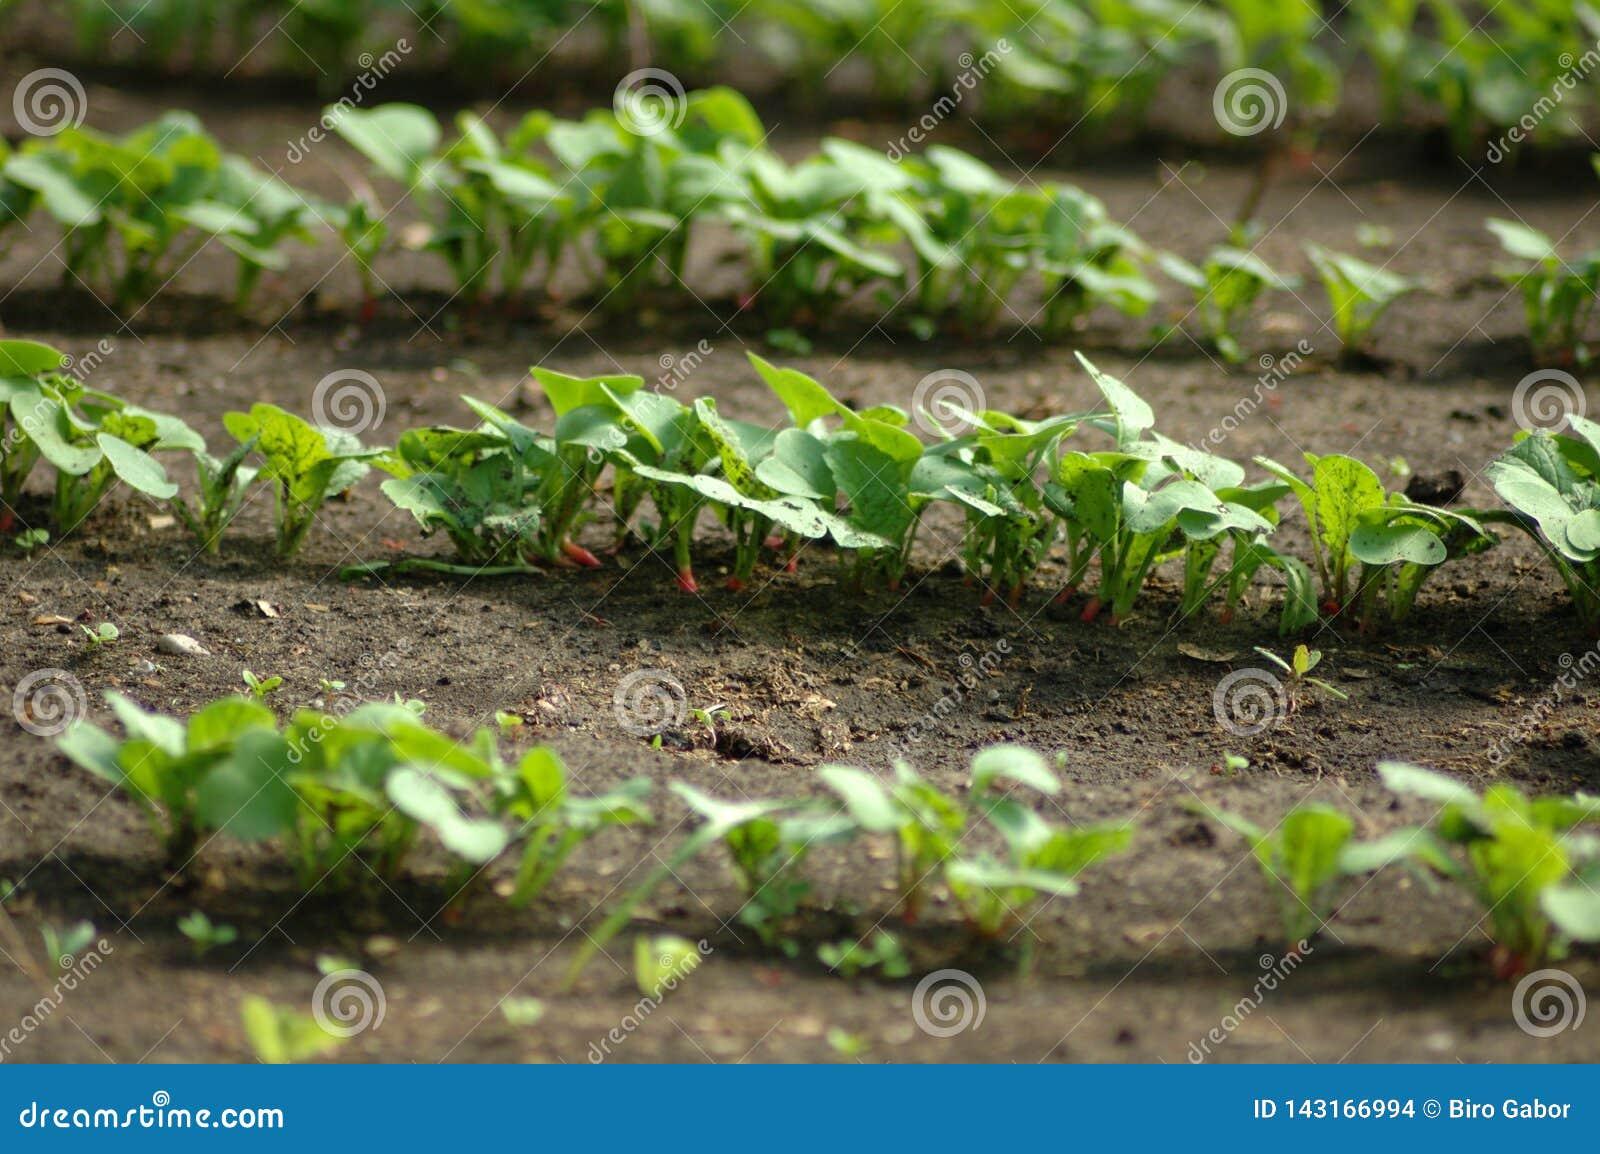 Radish seedling rows in spring.